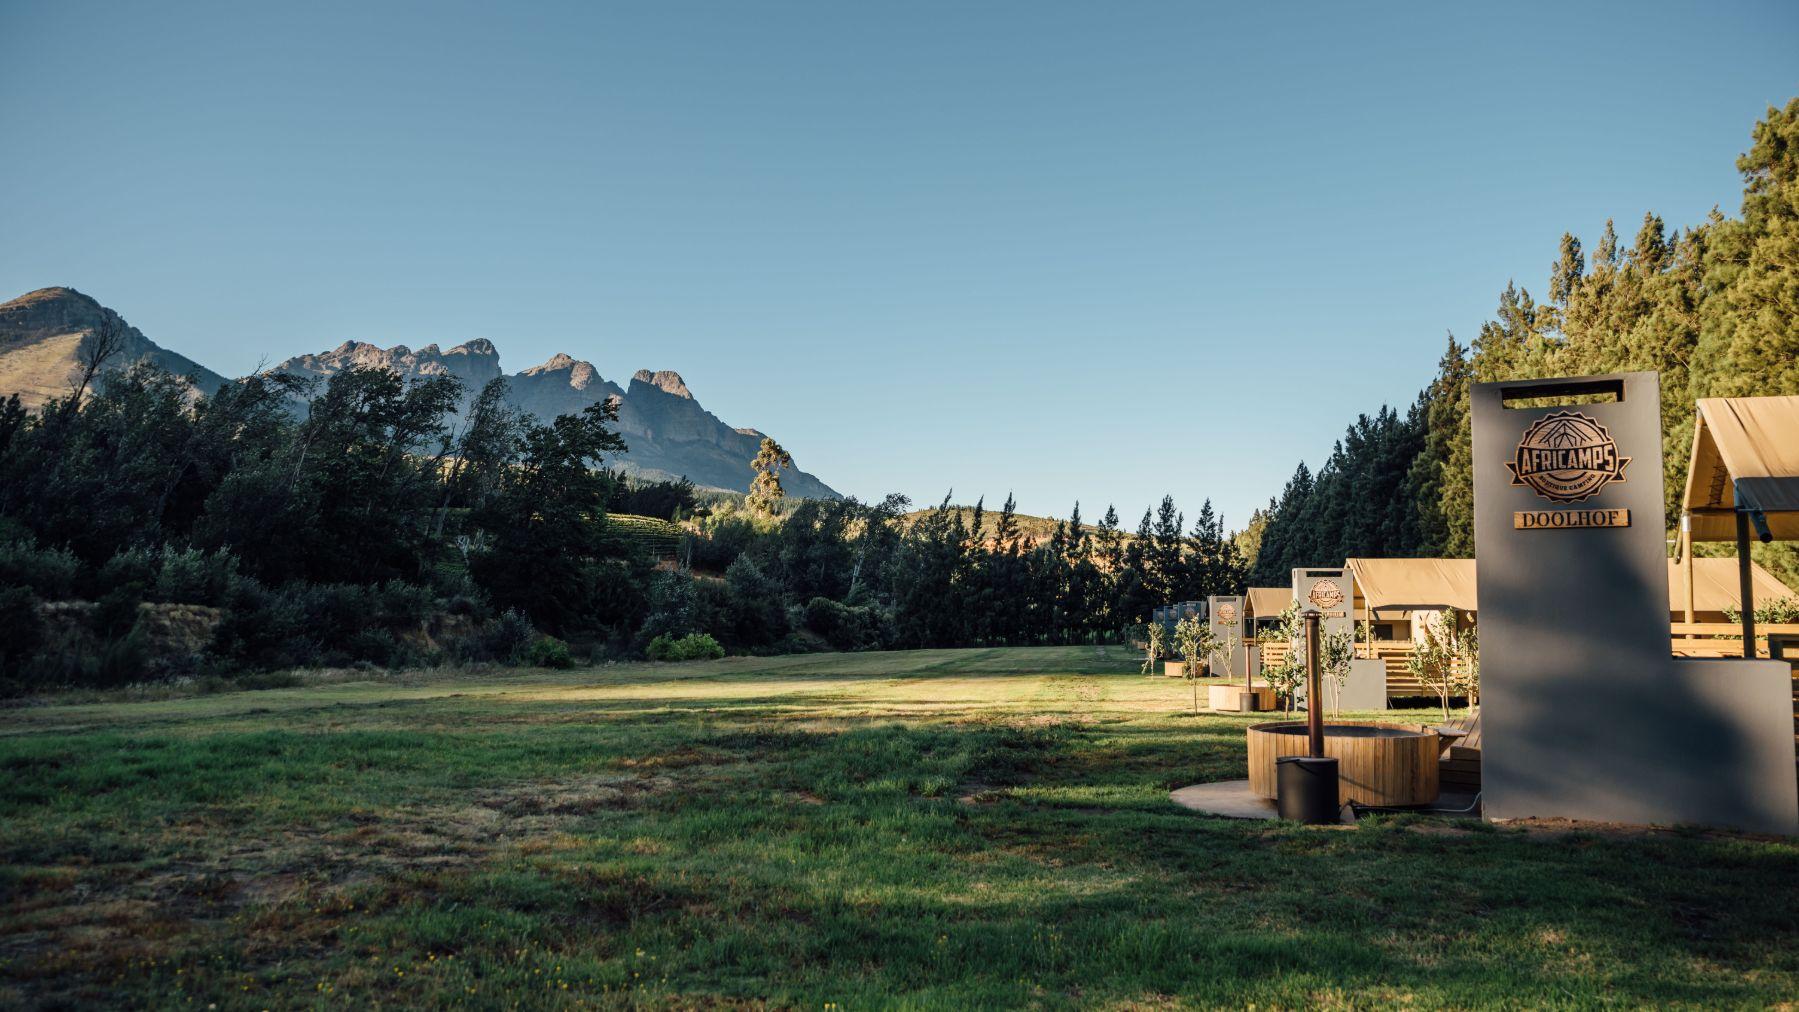 africamps doolhof wellington glamping south africa winelands